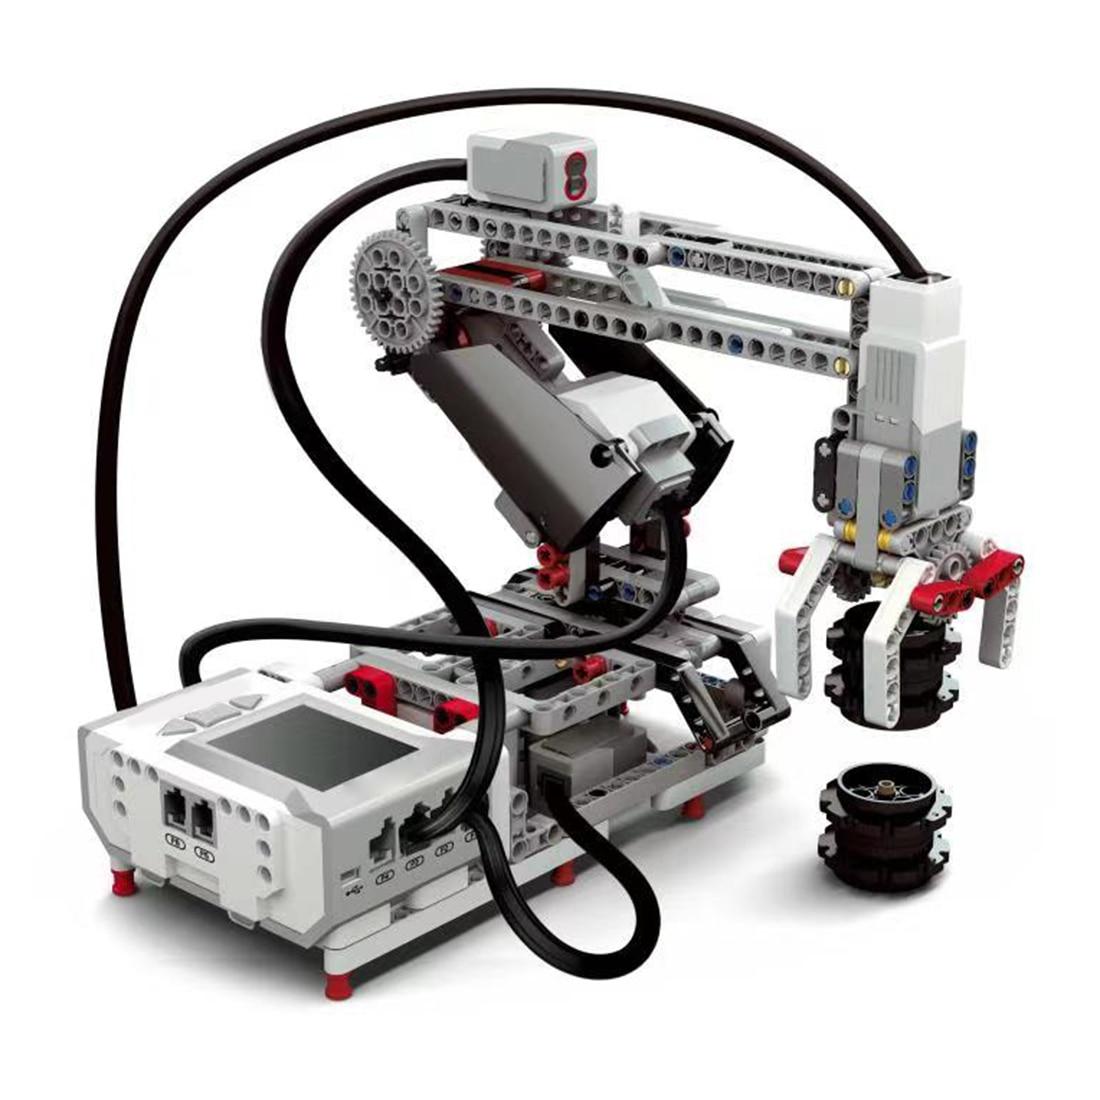 Programmable Building Block Assembly Robot Kit DIY Multifunctional Educational Learning Kit For Children Kids Educational Toys